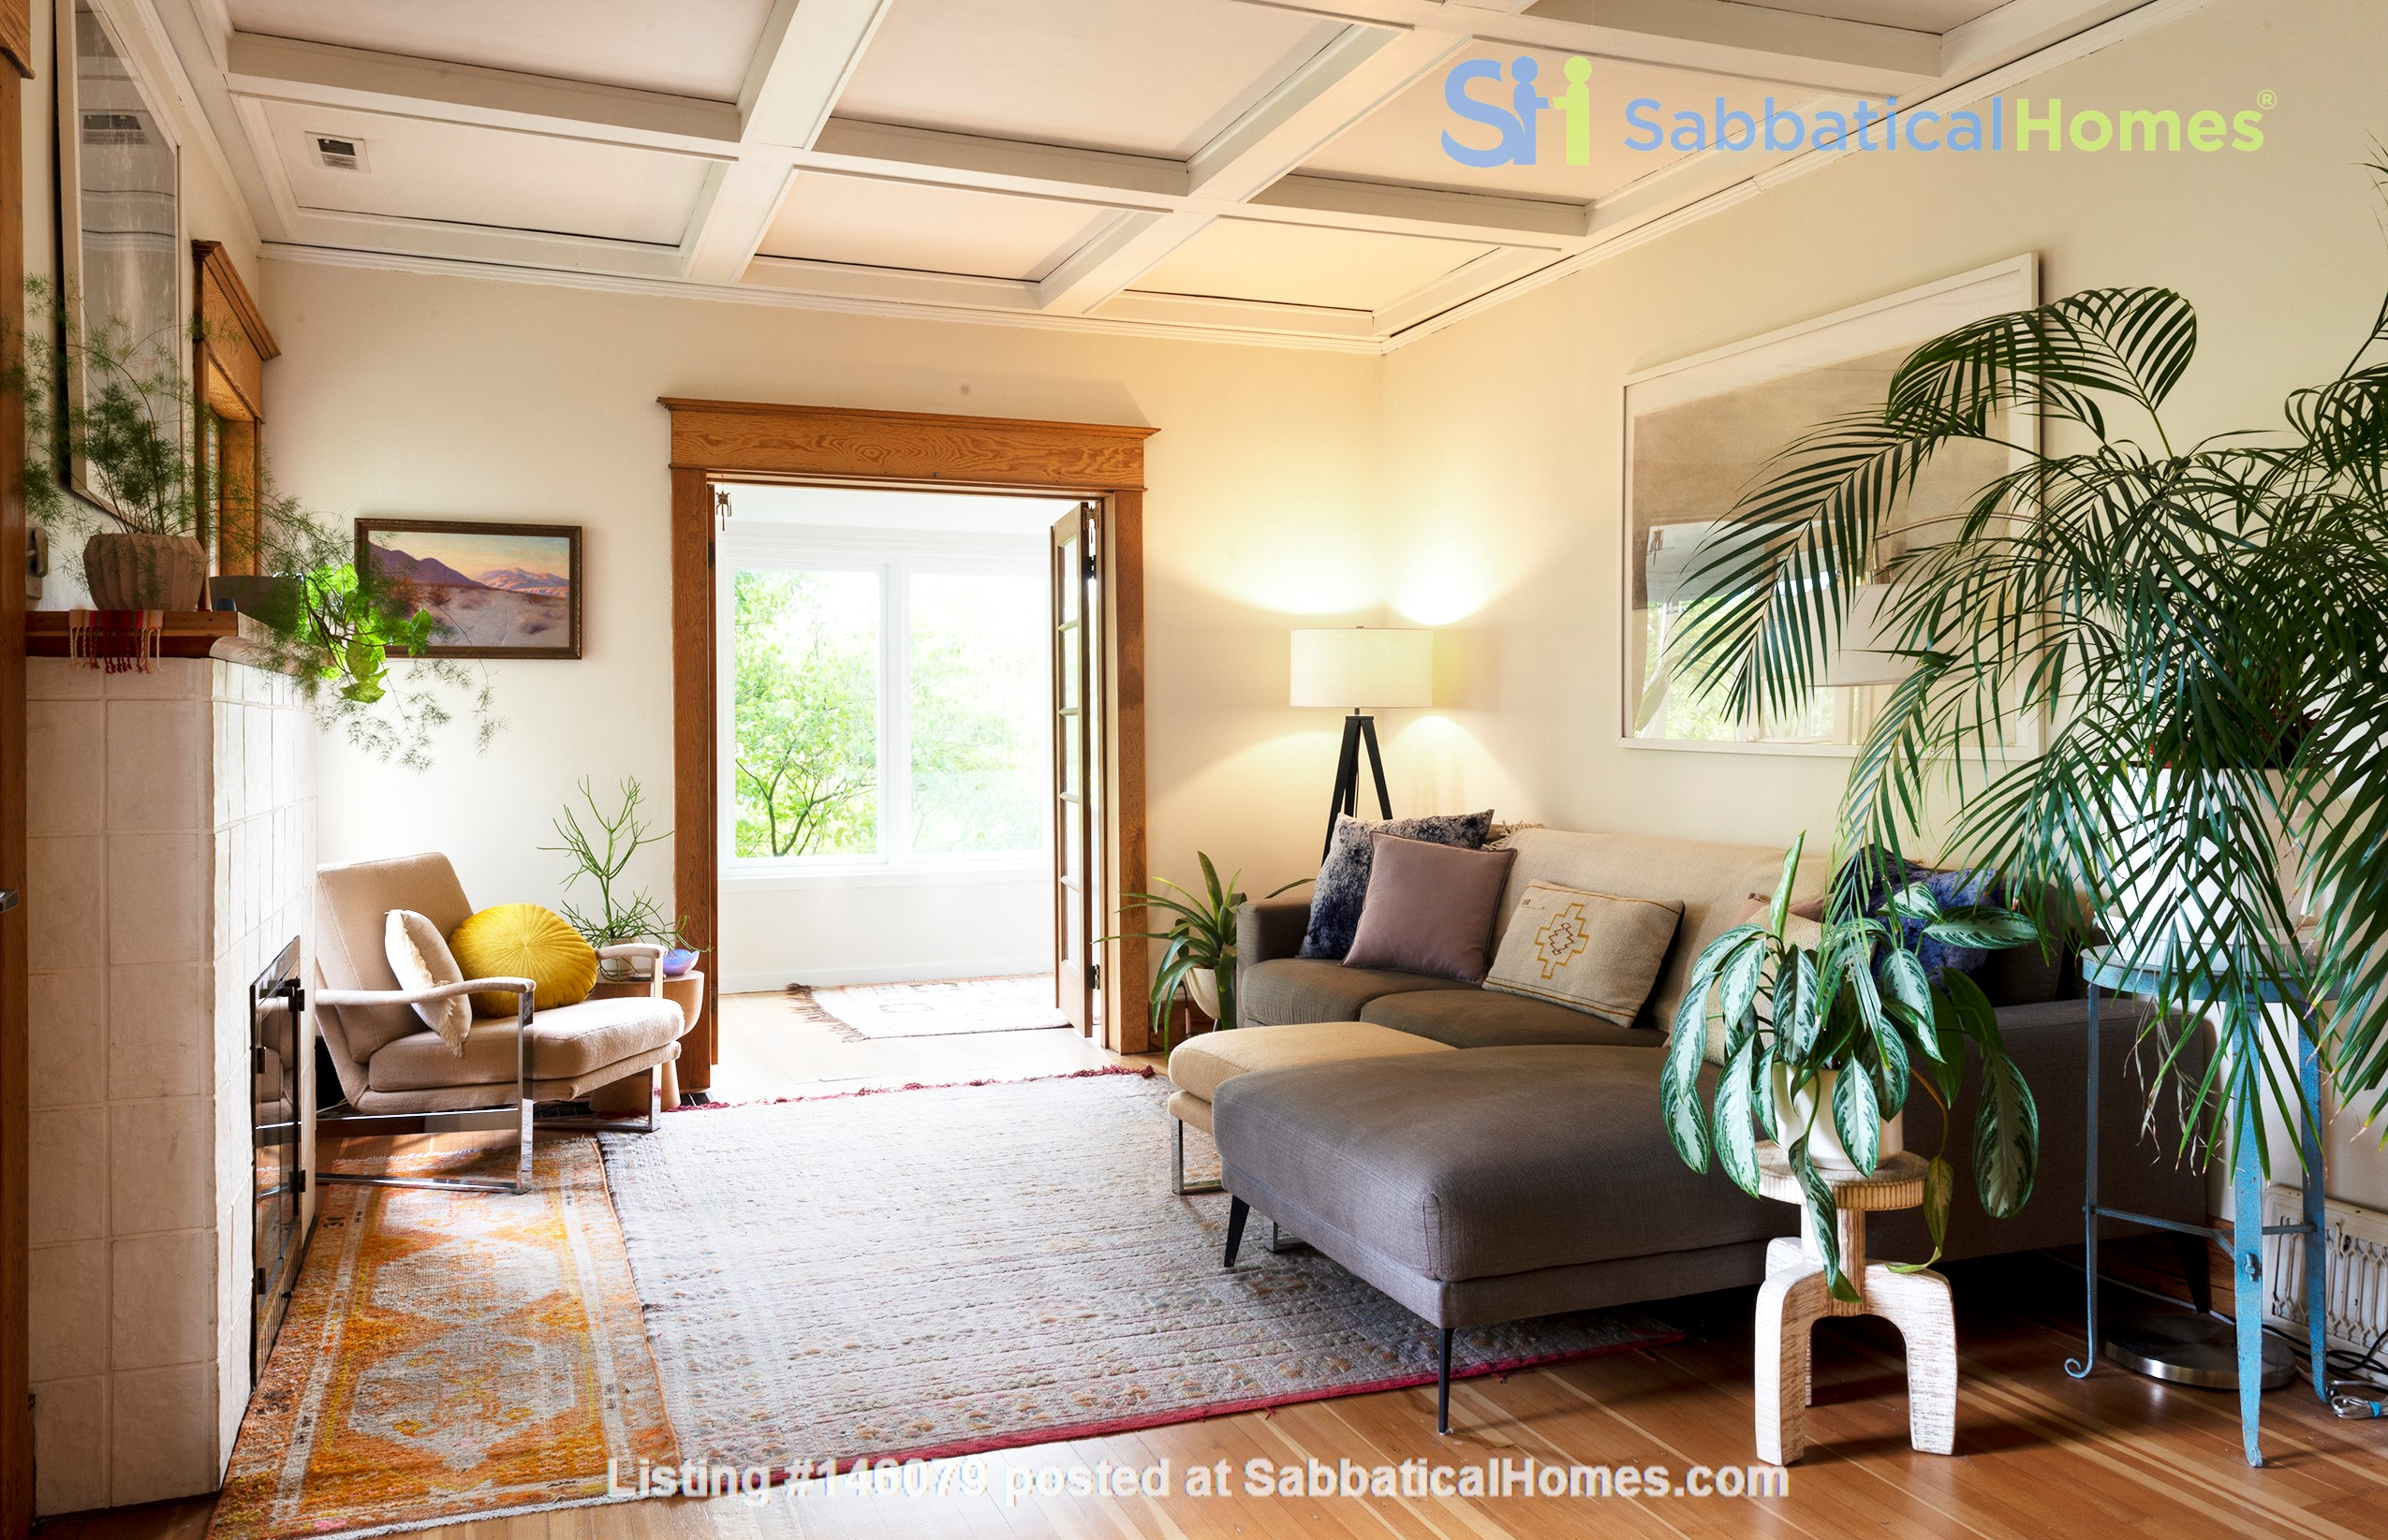 Scandinavian Queen Anne Home Home Rental in Seattle 1